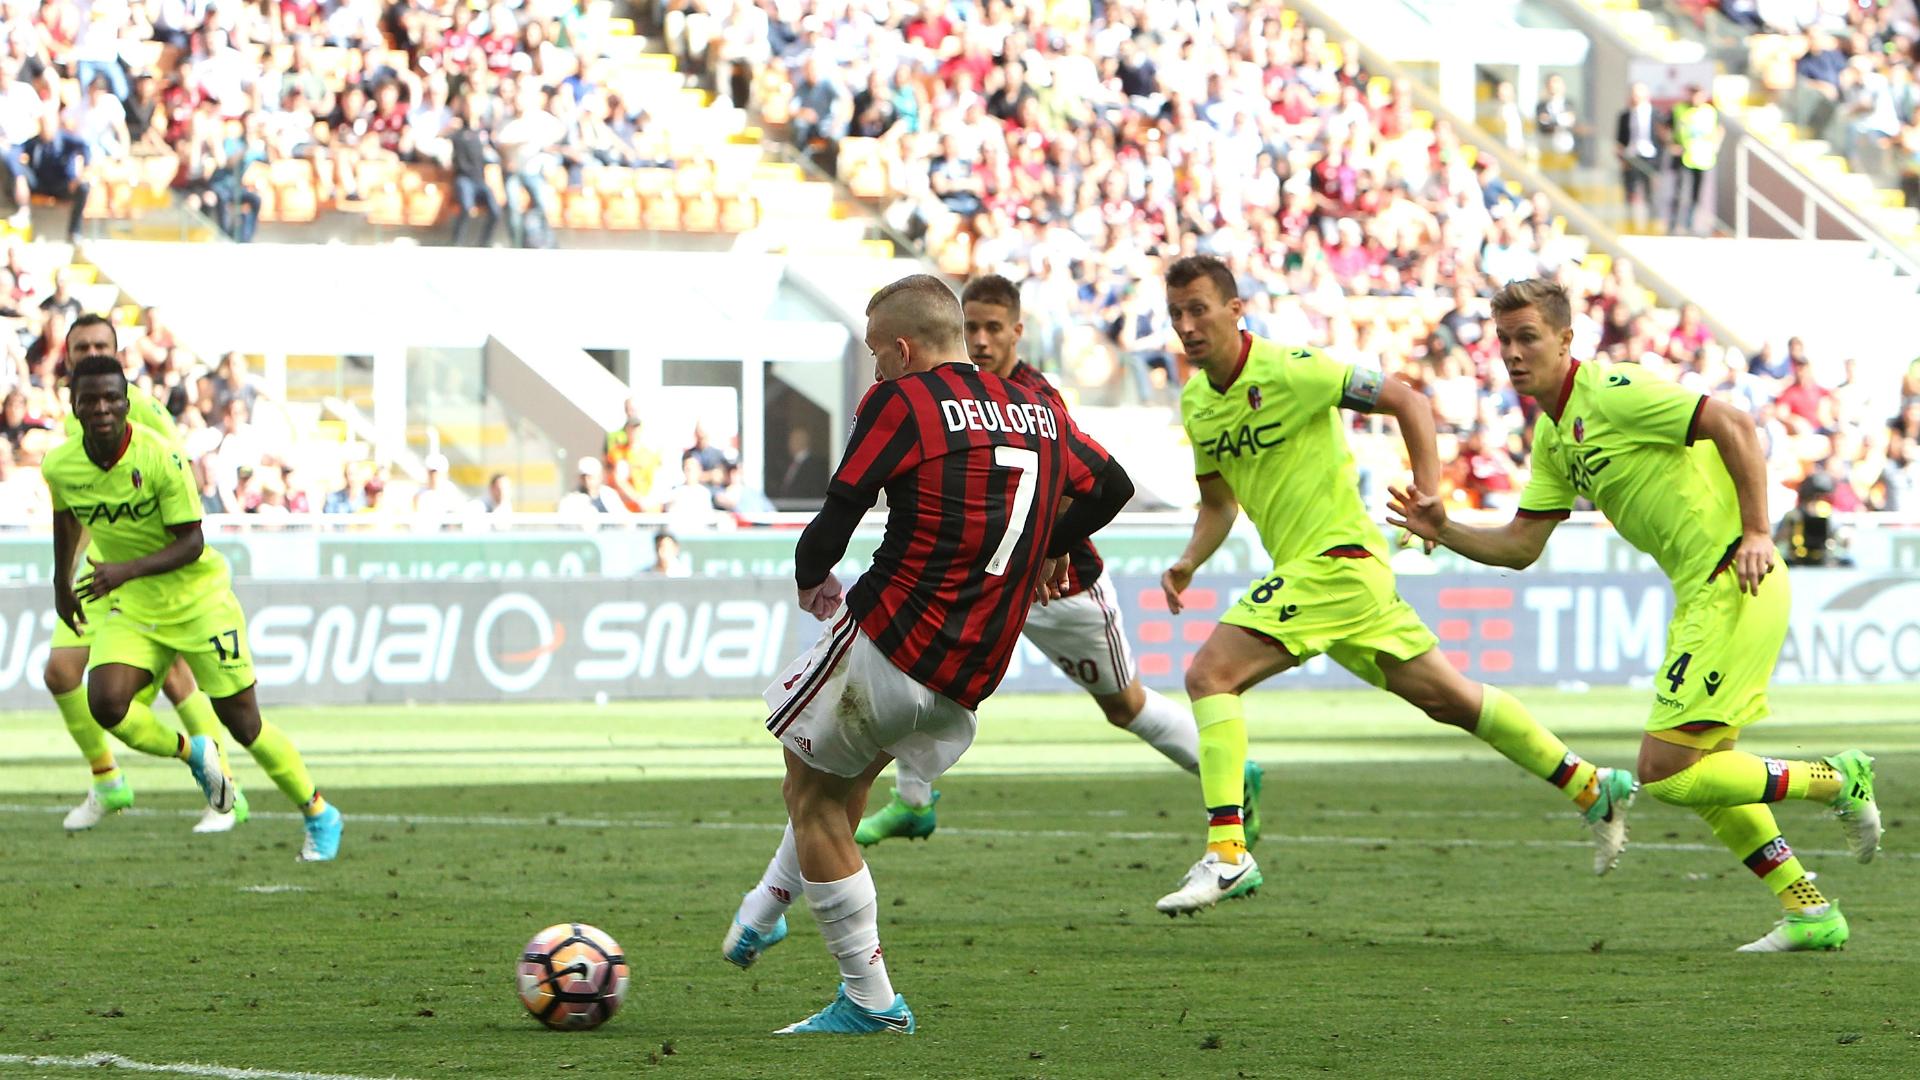 Honda confirms AC Milan exit after hard campaign